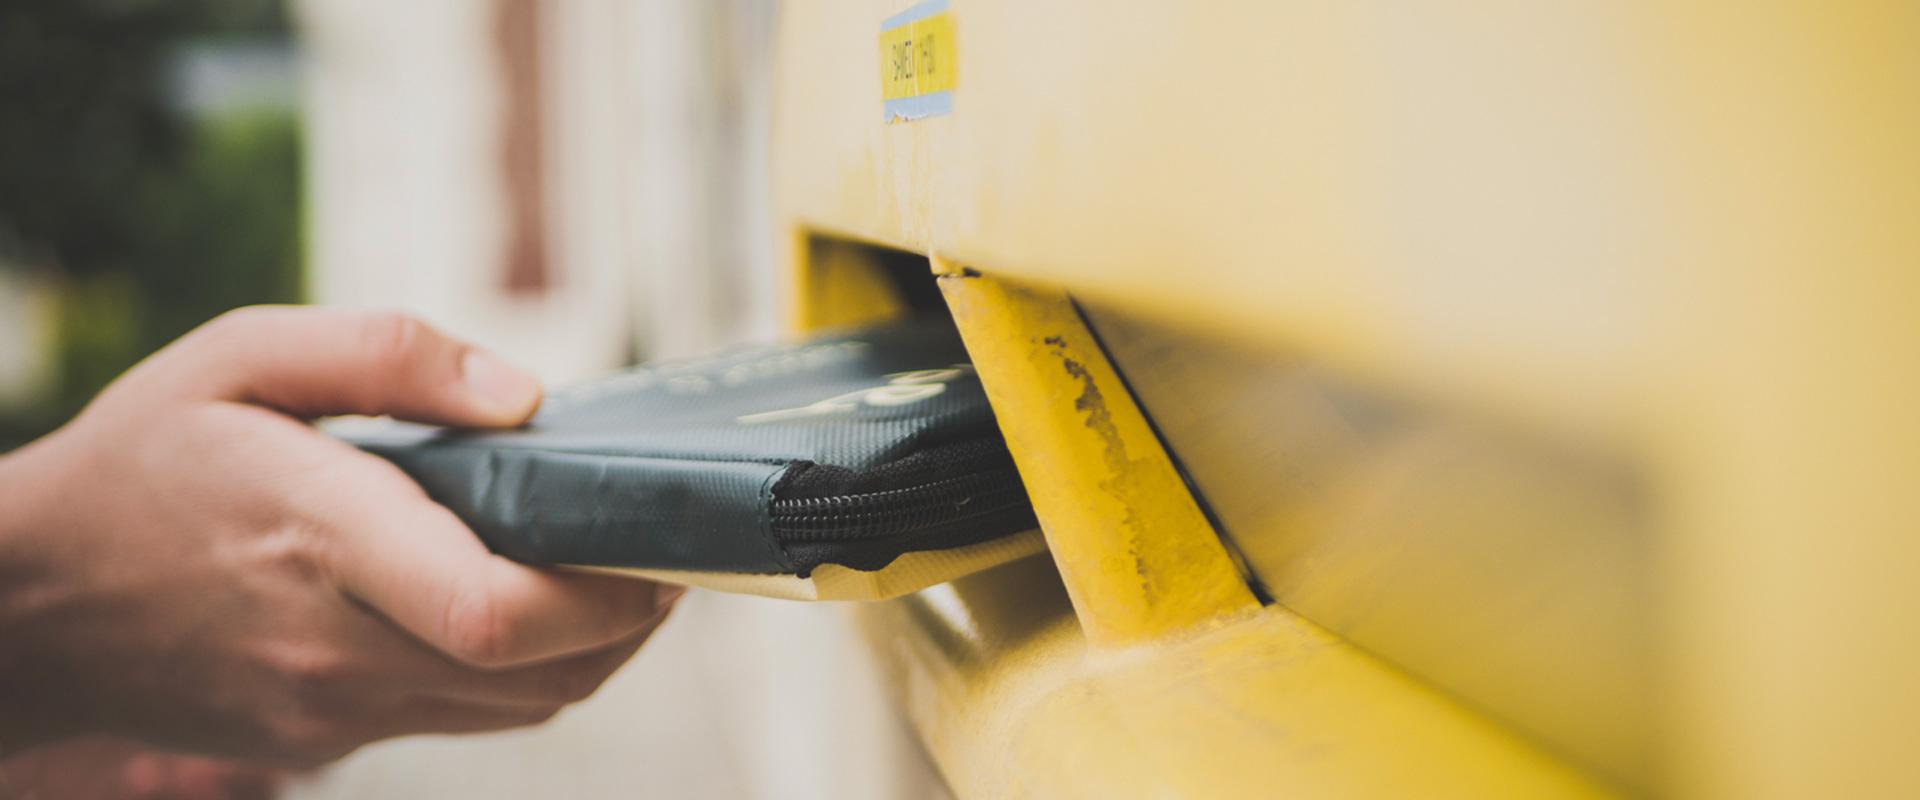 HIPI reusable parcel return yellow box